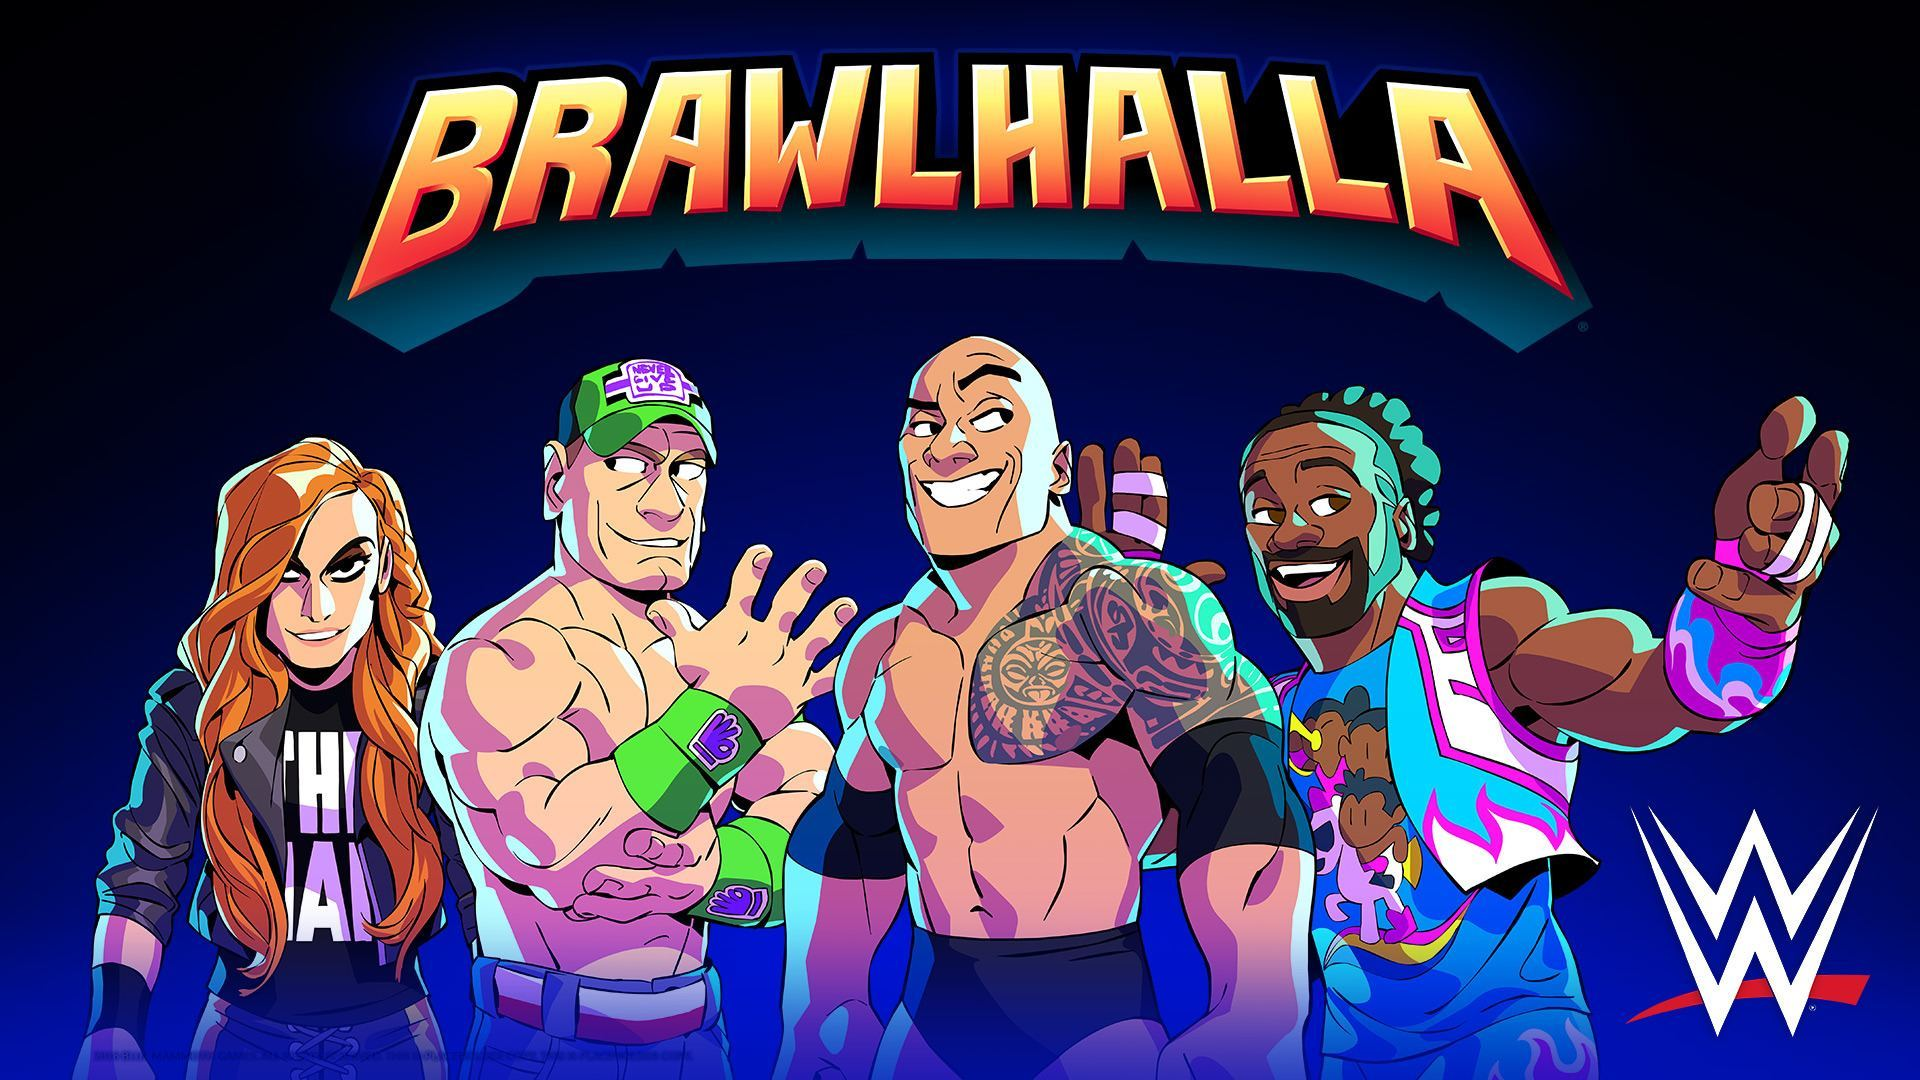 Brawlhalla WWE Event – WWEsplashLogos